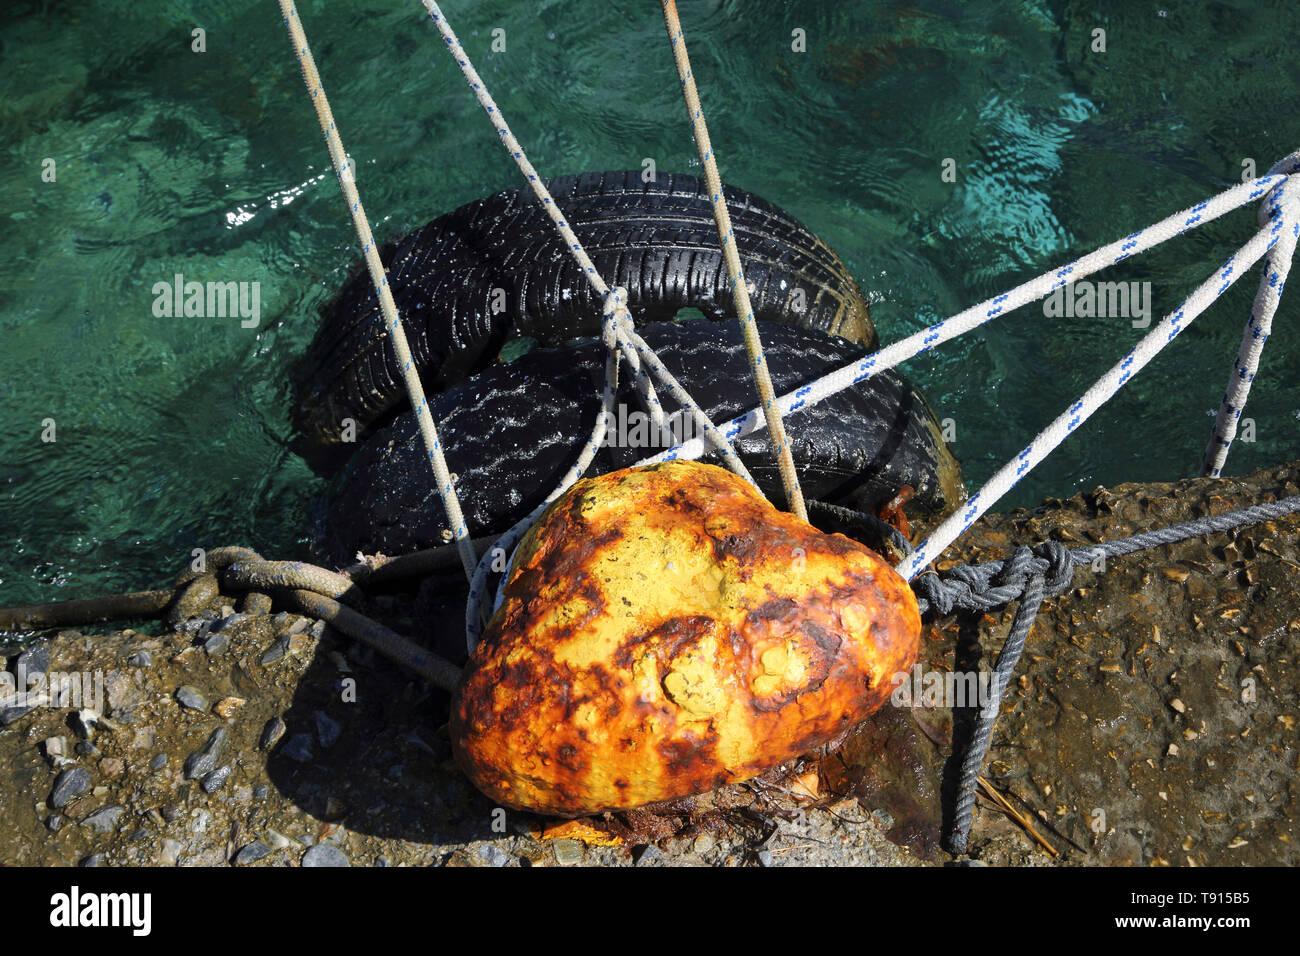 Vourkari Kea Island Greece Boats tied off to Mooring Bollard - Stock Image